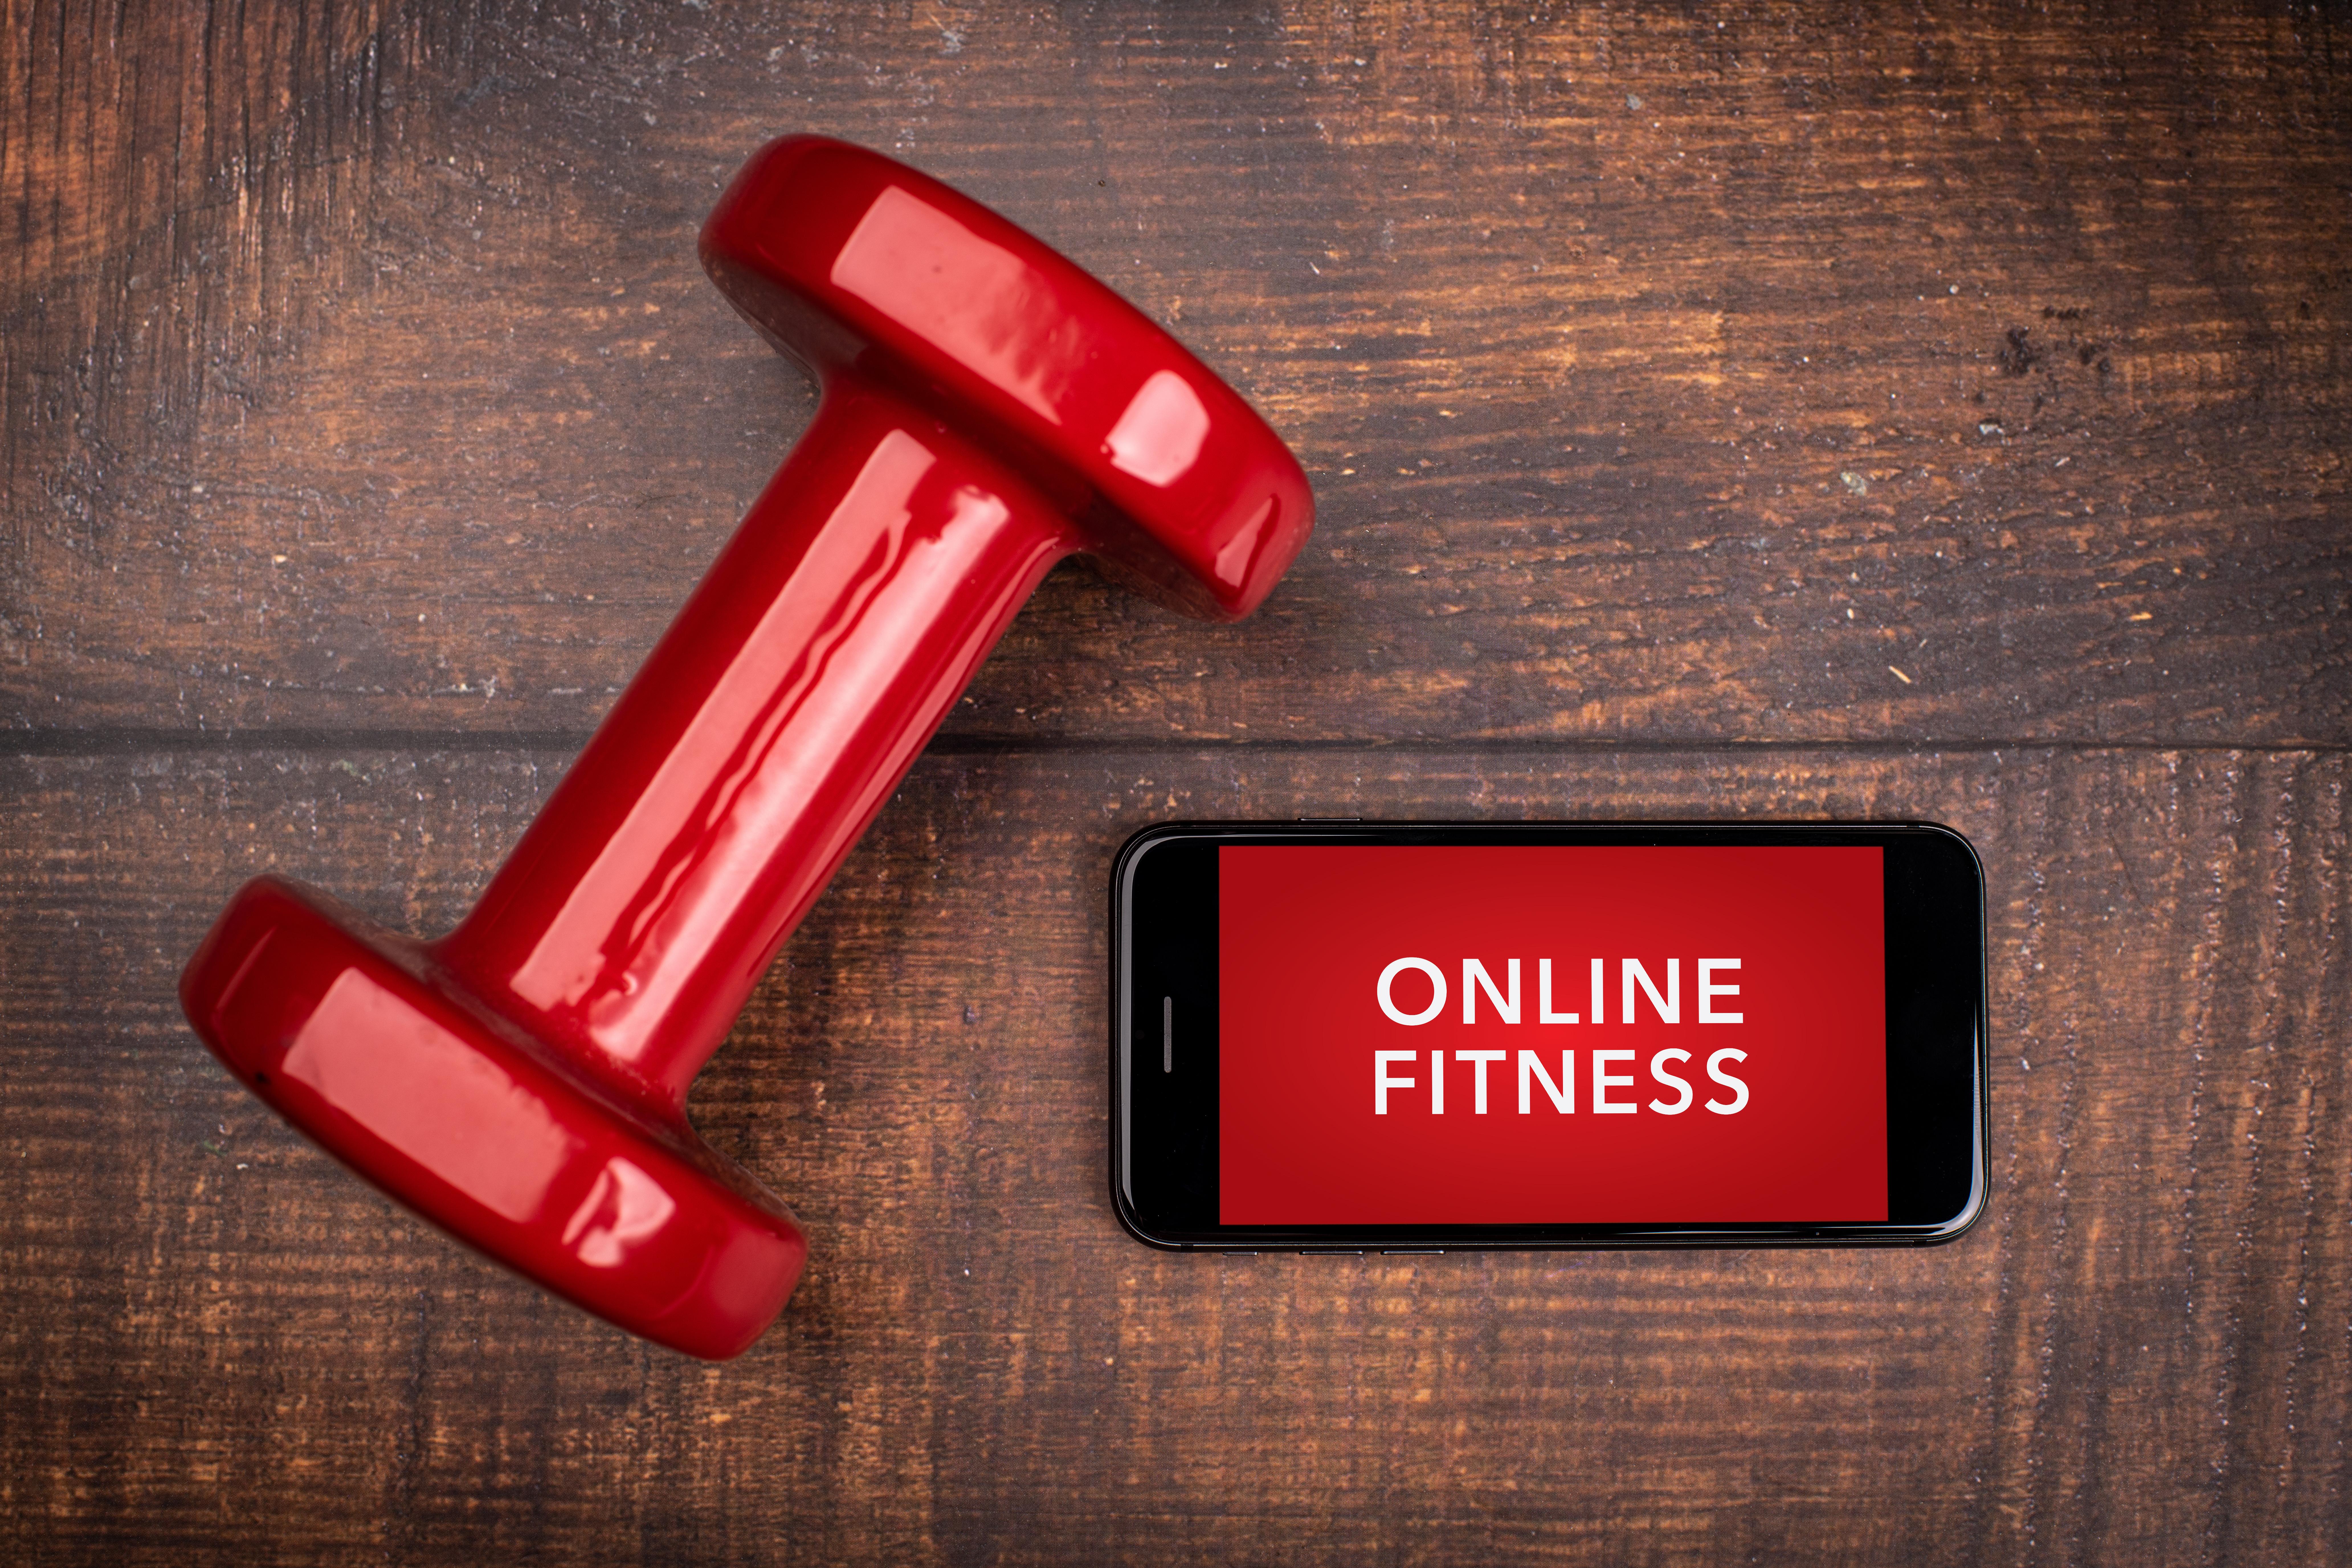 David Todd Fitness 12 Week Online fitness program